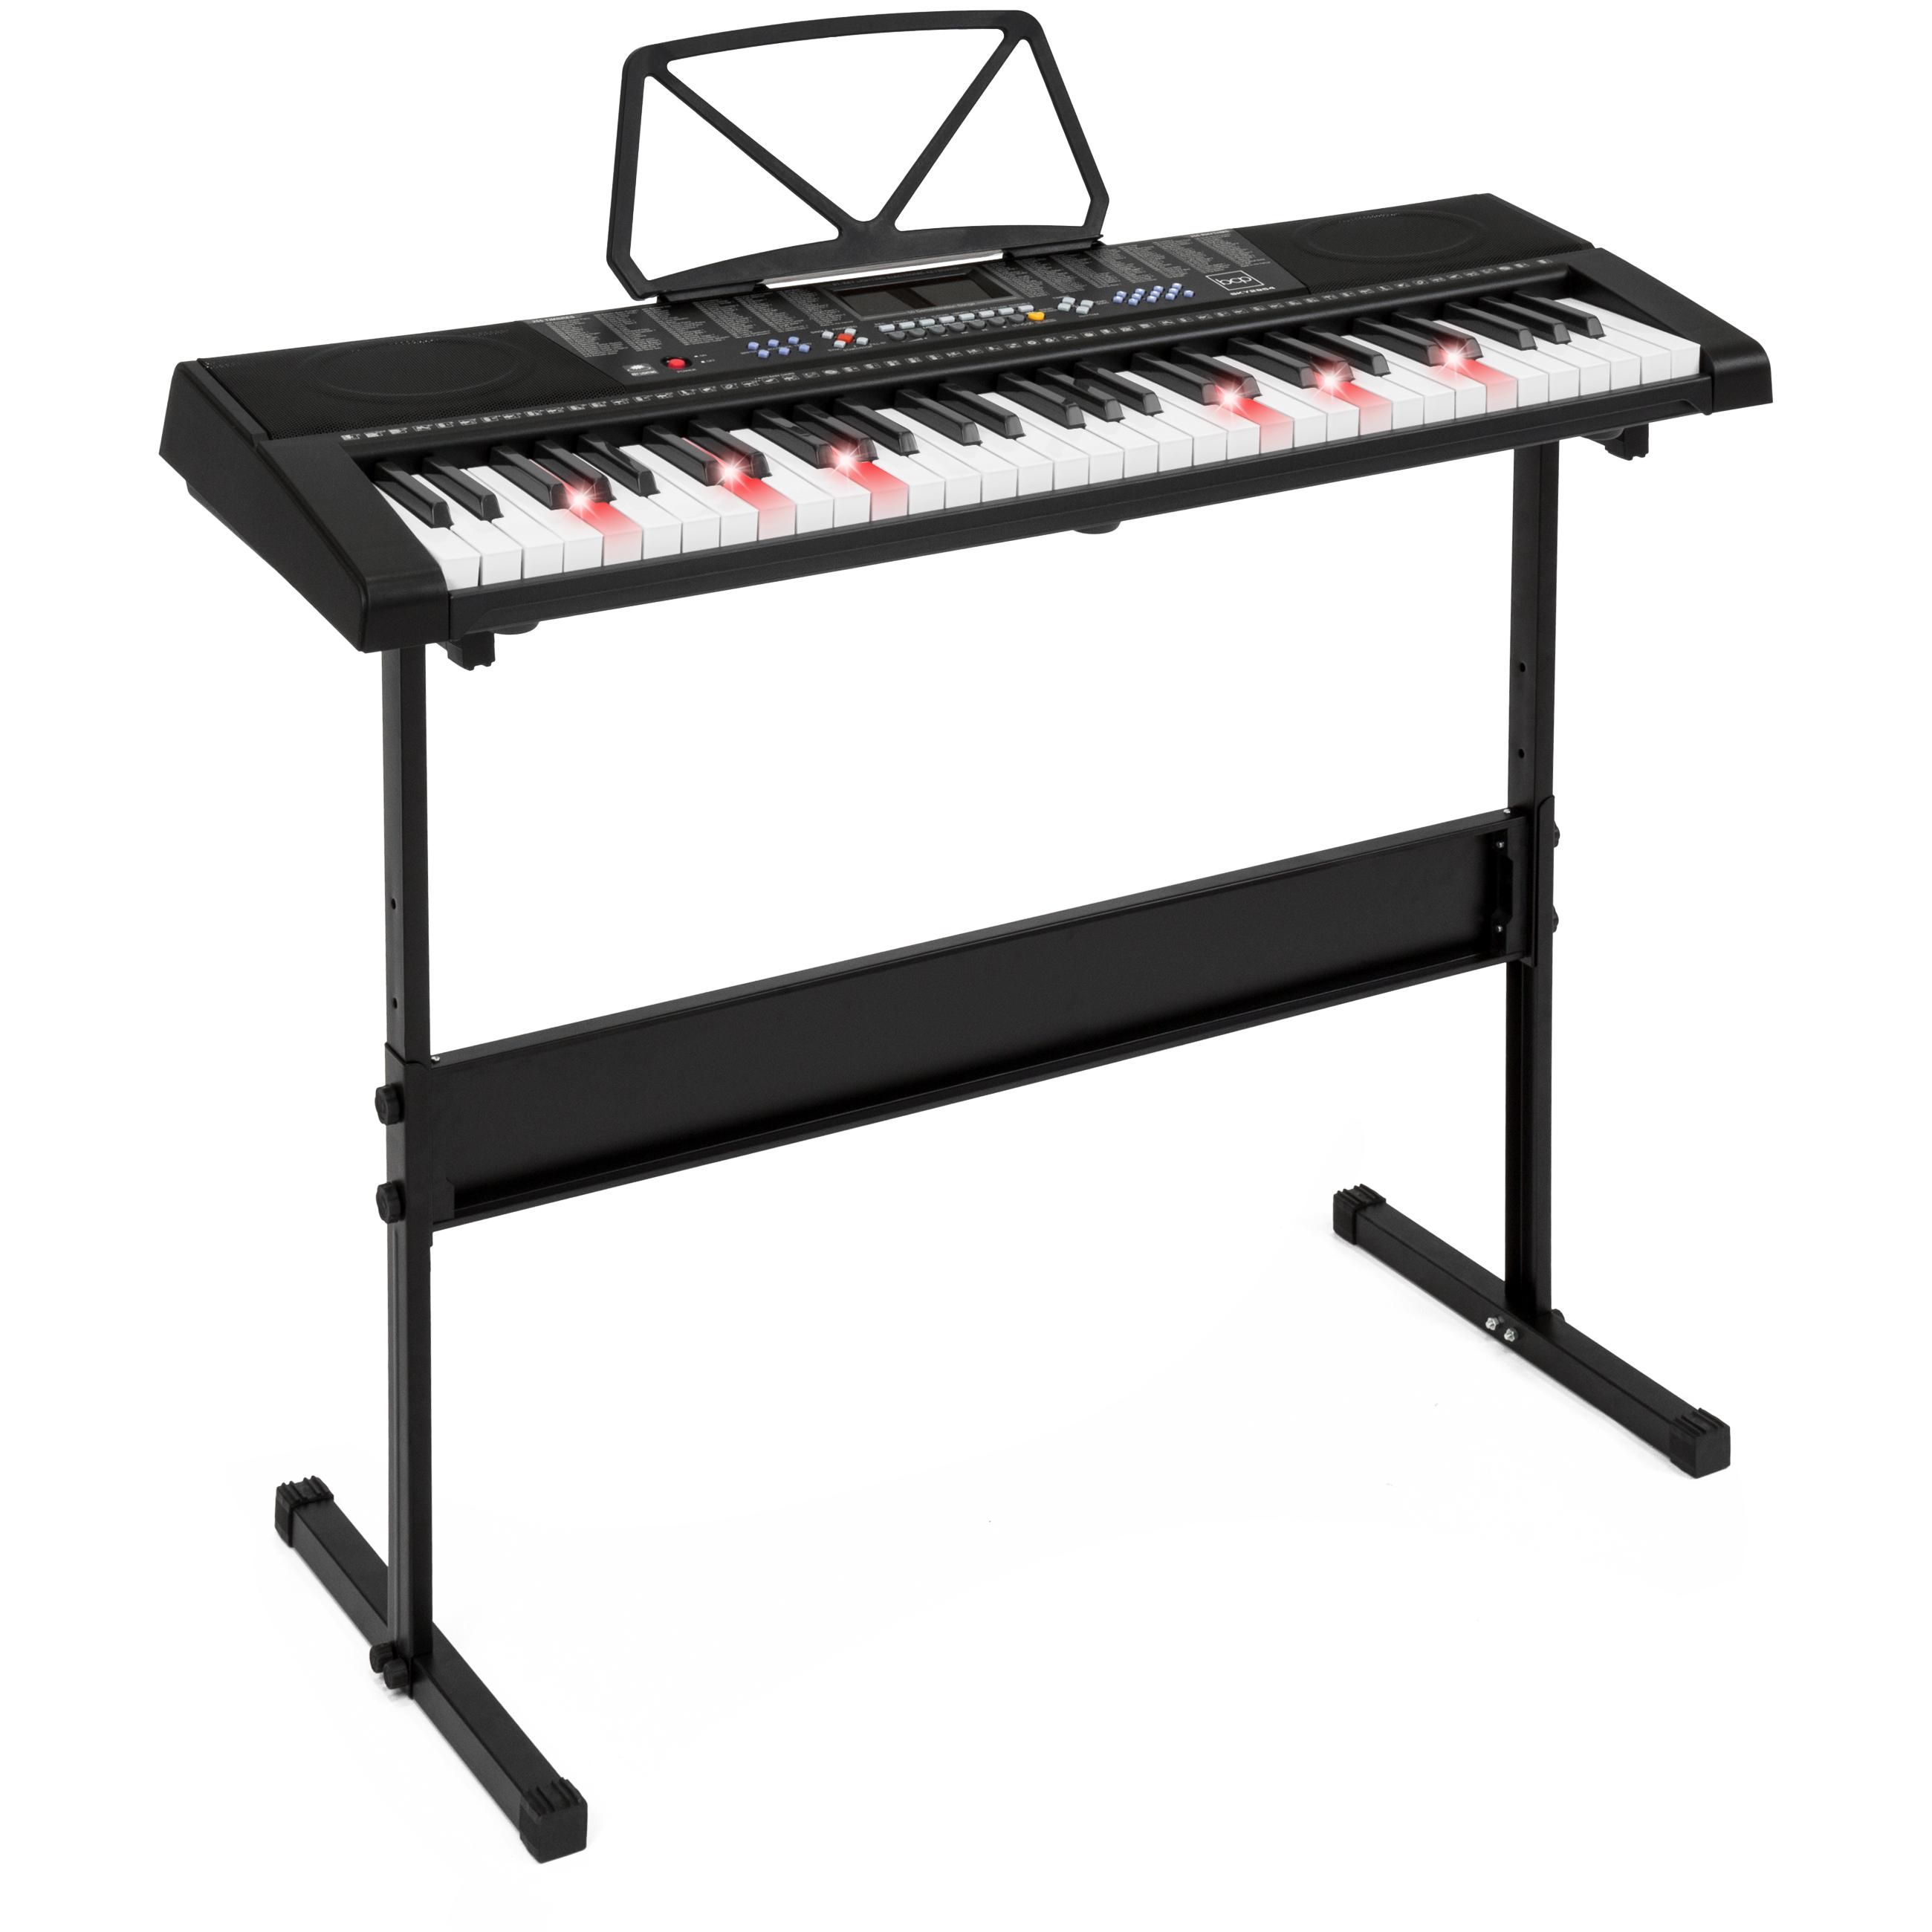 Teaching Electronic Keyboard Piano Set 61 Light Keys Led